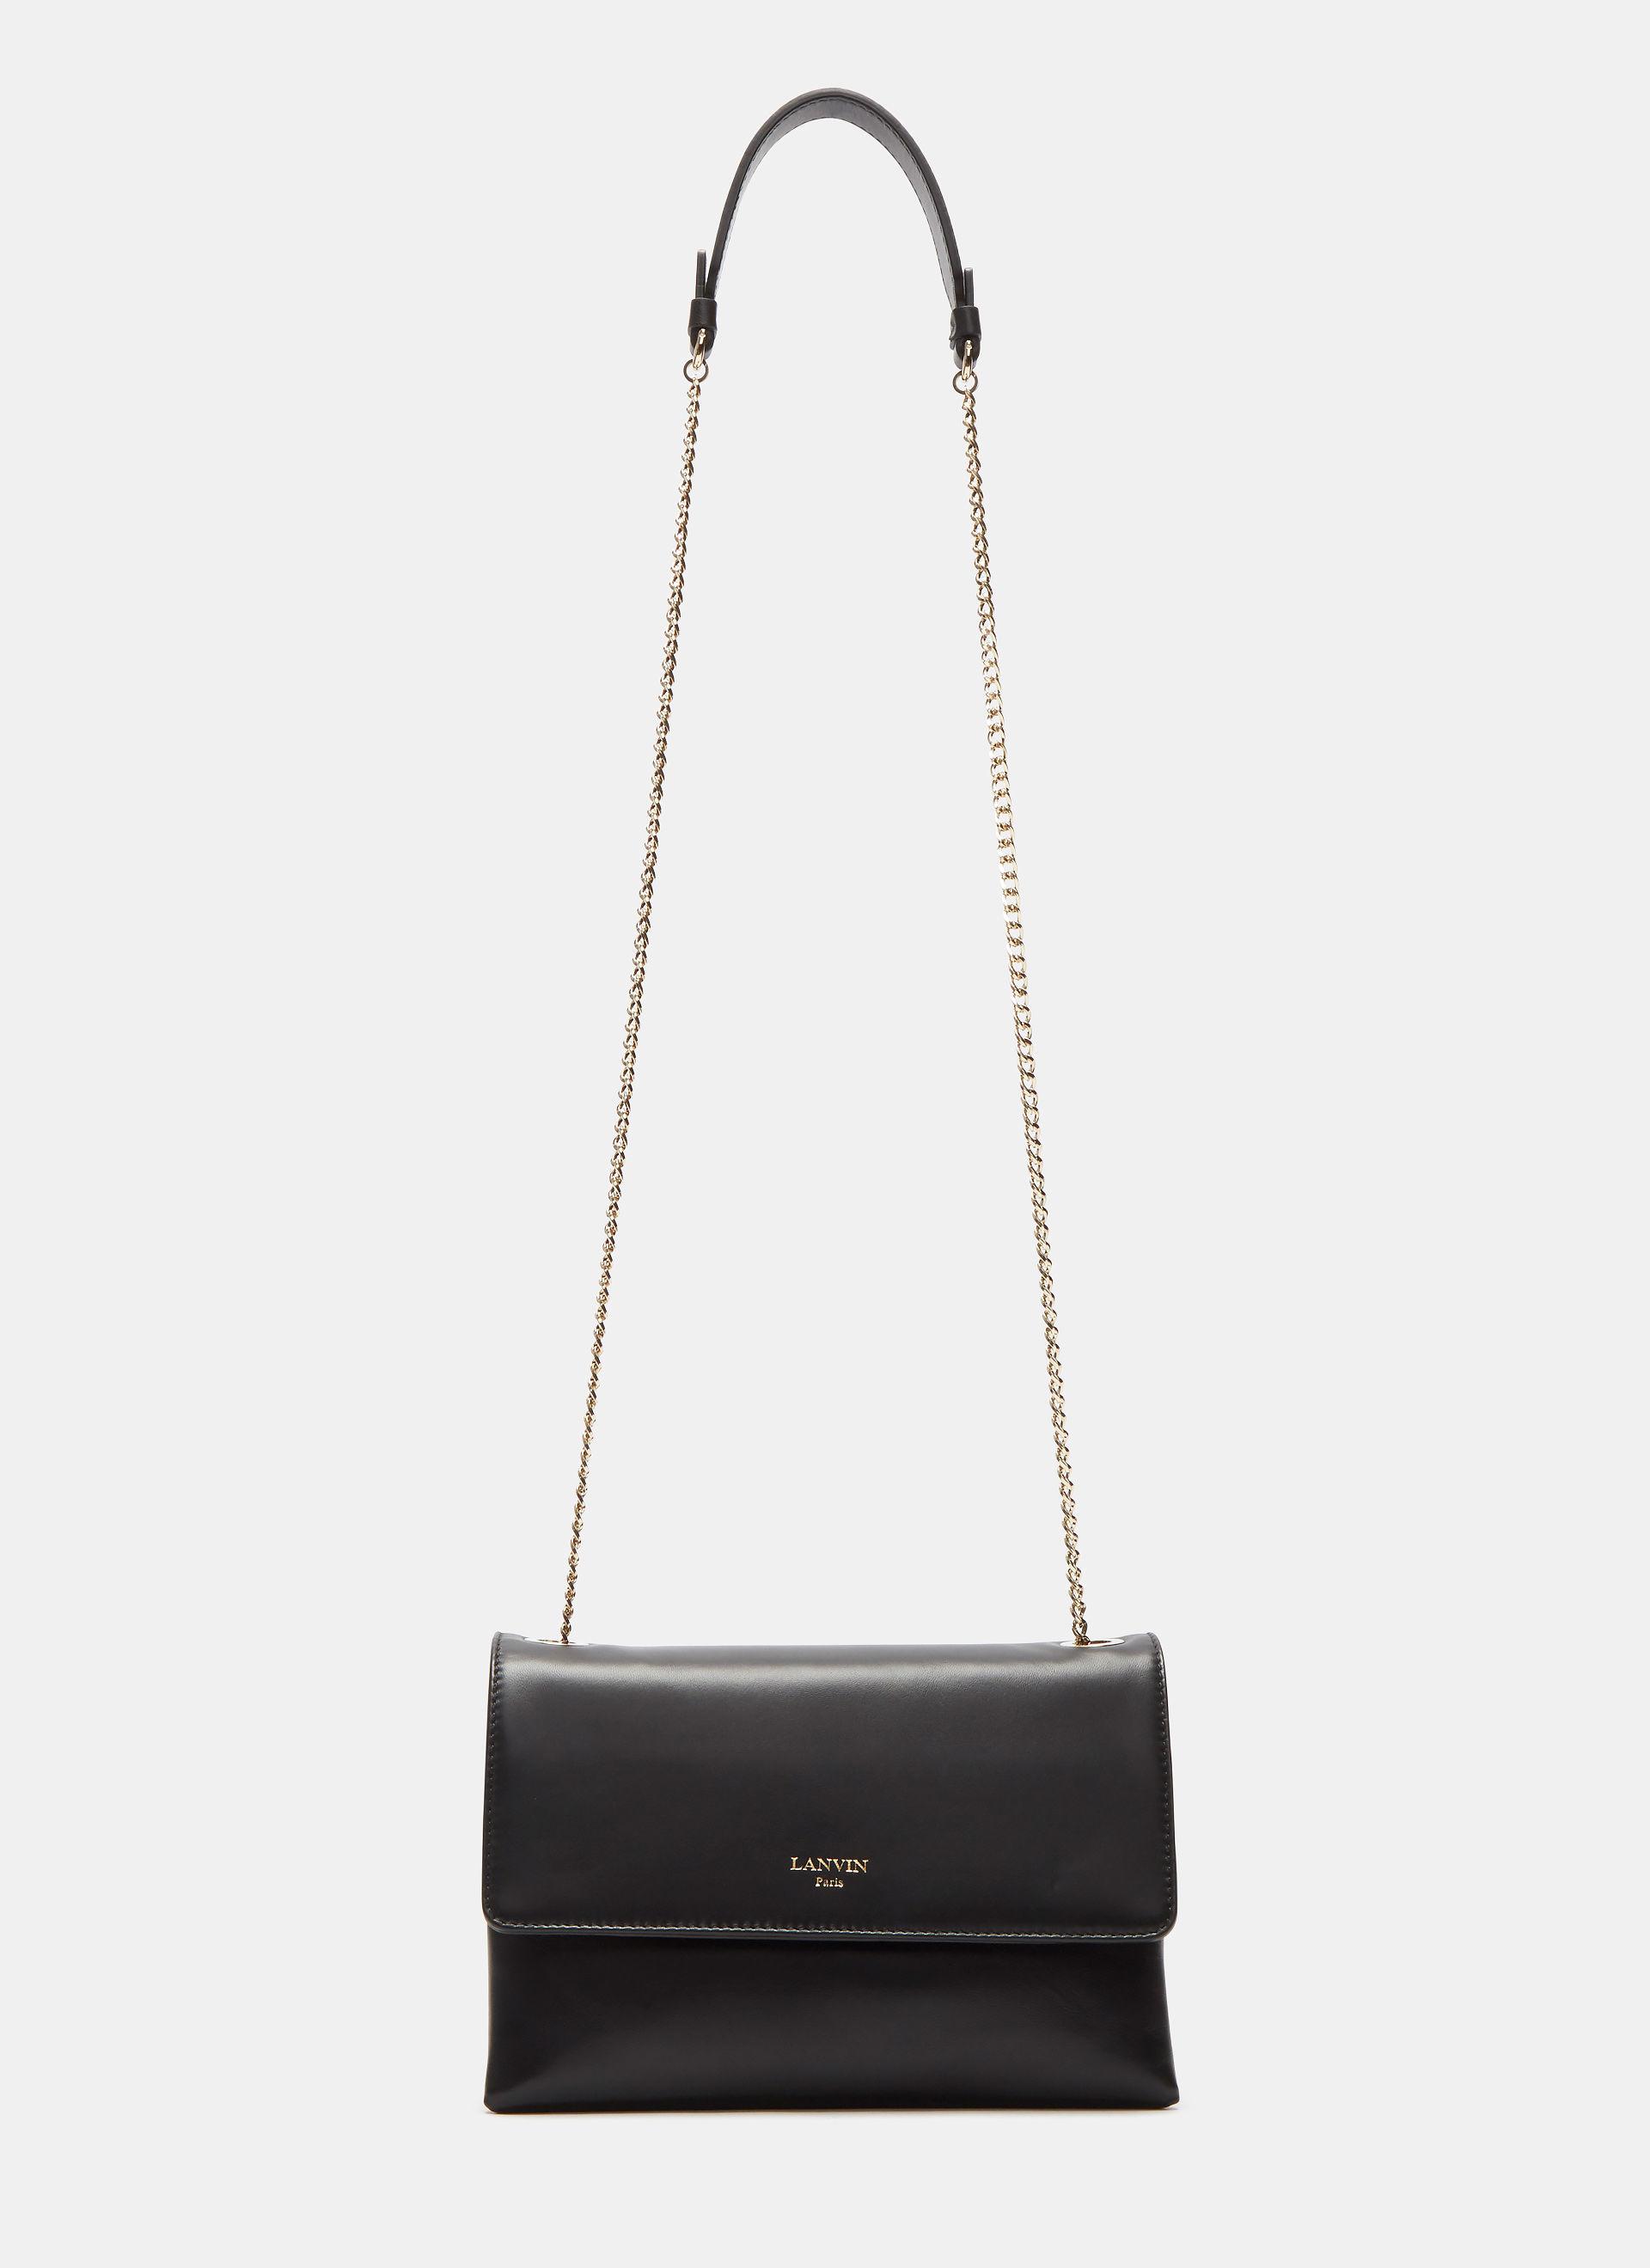 Lanvin Mini Sugar Crossbody Bag In Black